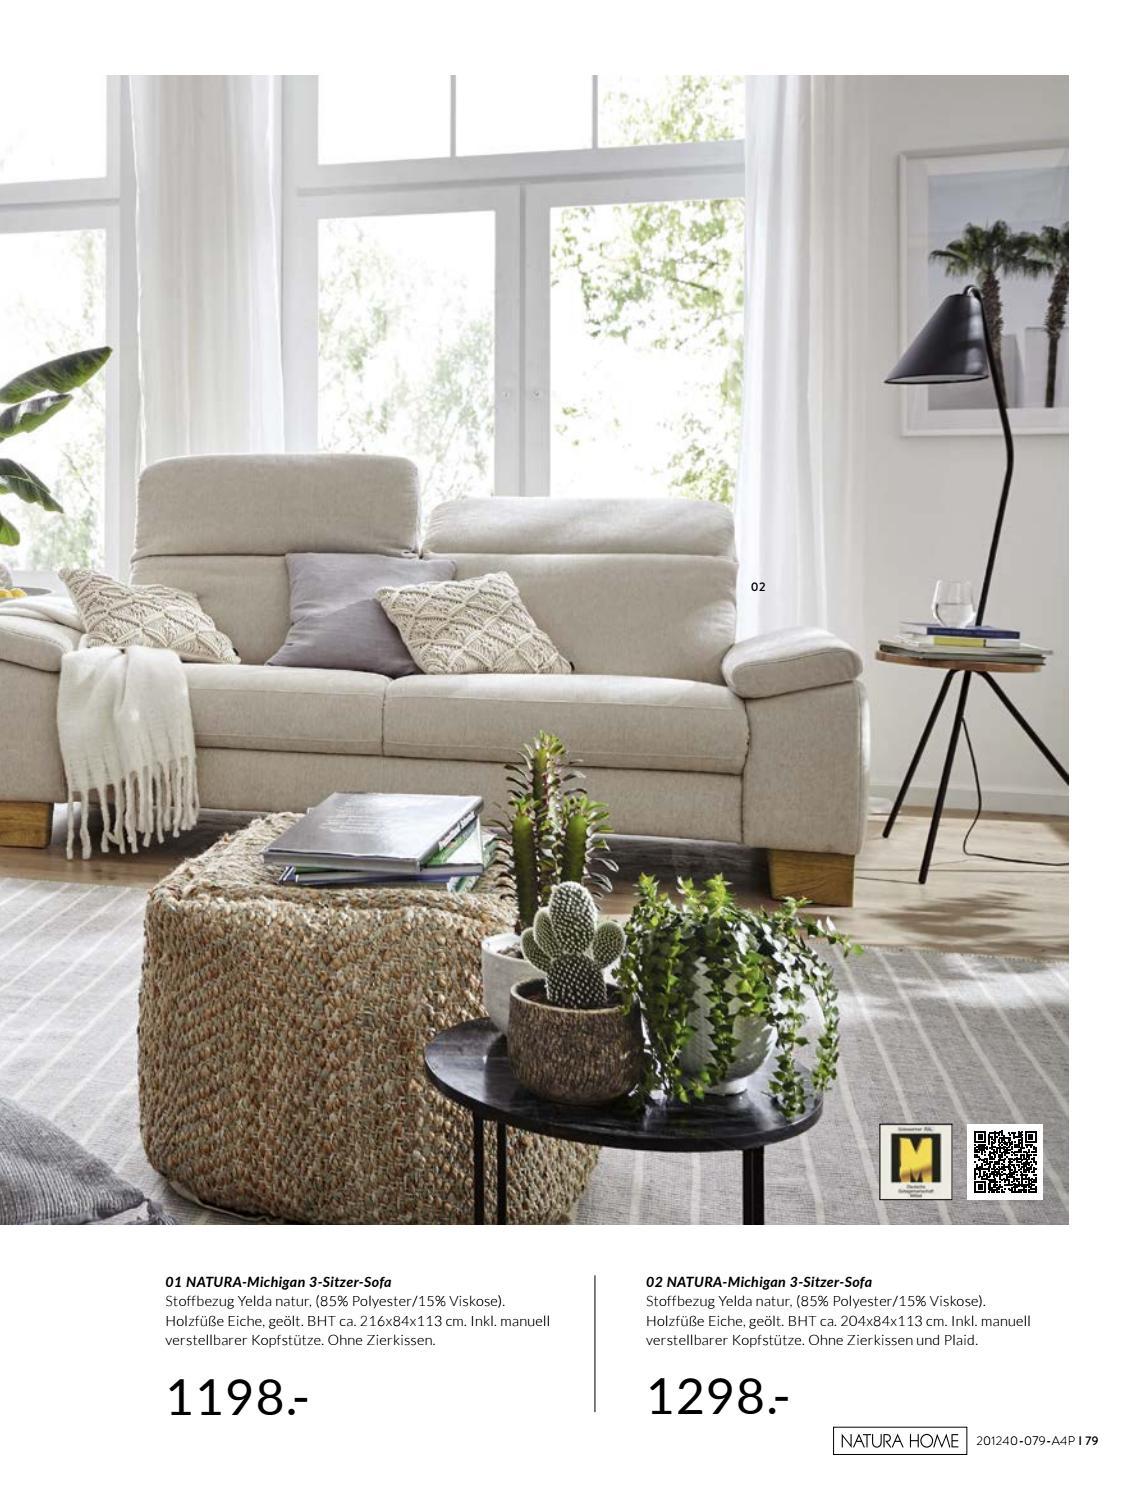 Full Size of Natura Sofa Gebraucht Home Denver Pasadena Livingston Kaufen Newport Couch Brooklyn Kansas Love By Europa Mbel Verbund Gmbh Federkern Modernes 3er Grau Xxl Sofa Natura Sofa